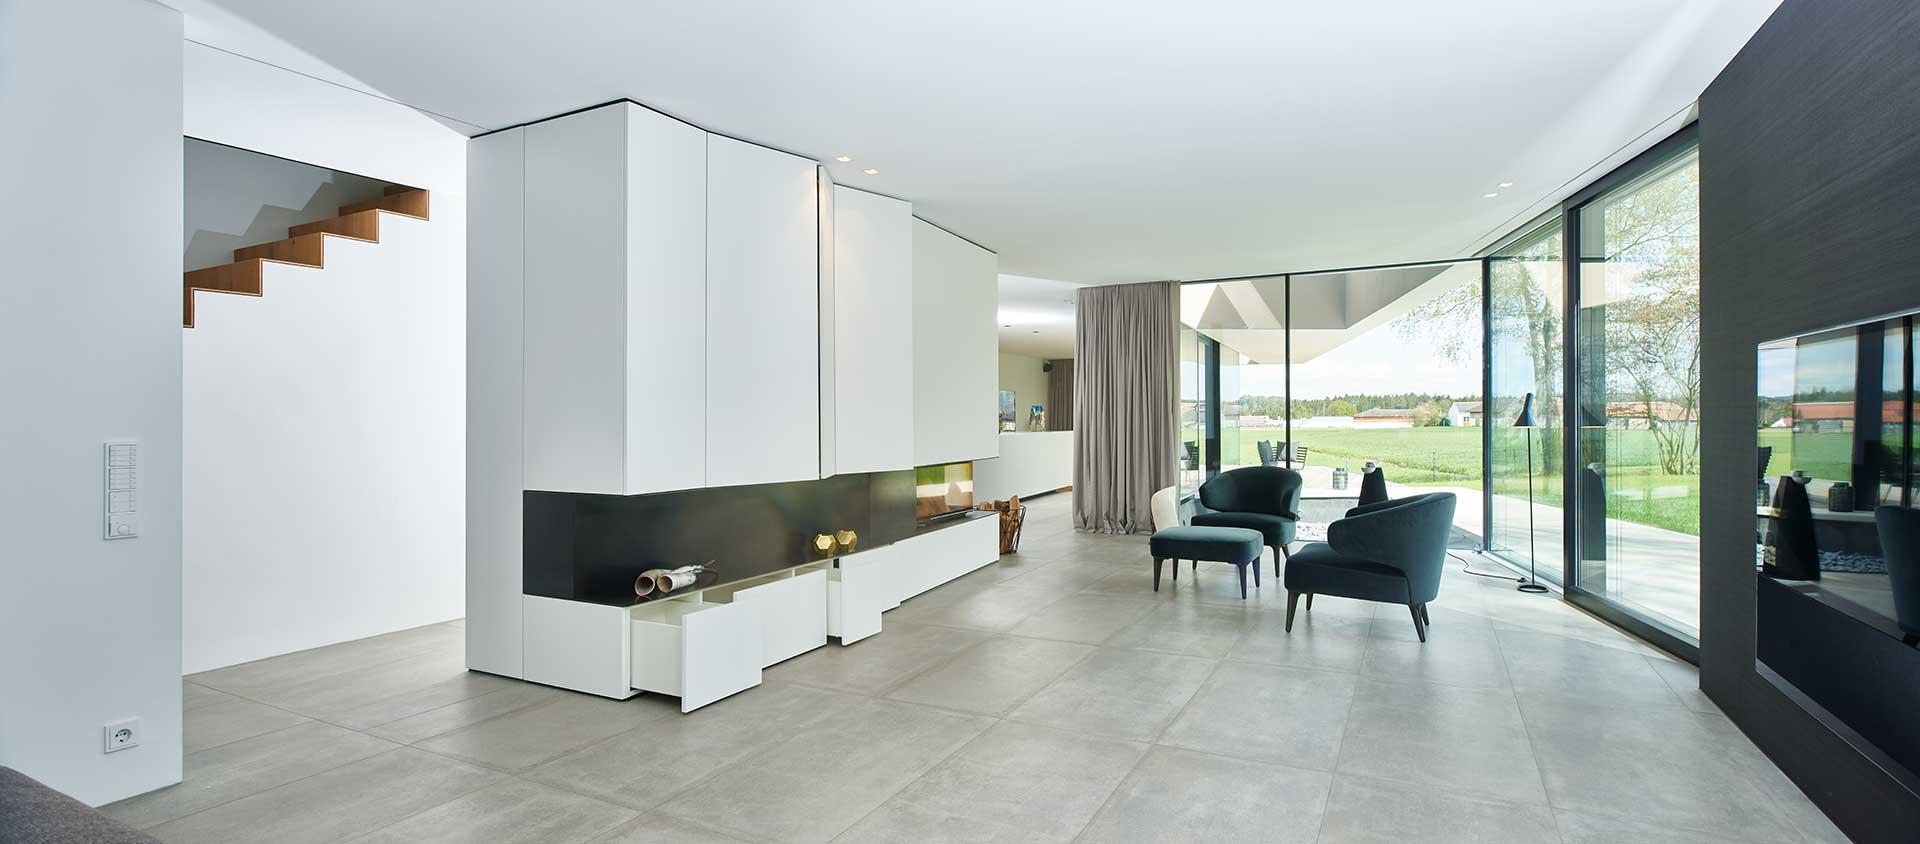 wohnzimmer 1 m bel b hler schorndorf. Black Bedroom Furniture Sets. Home Design Ideas